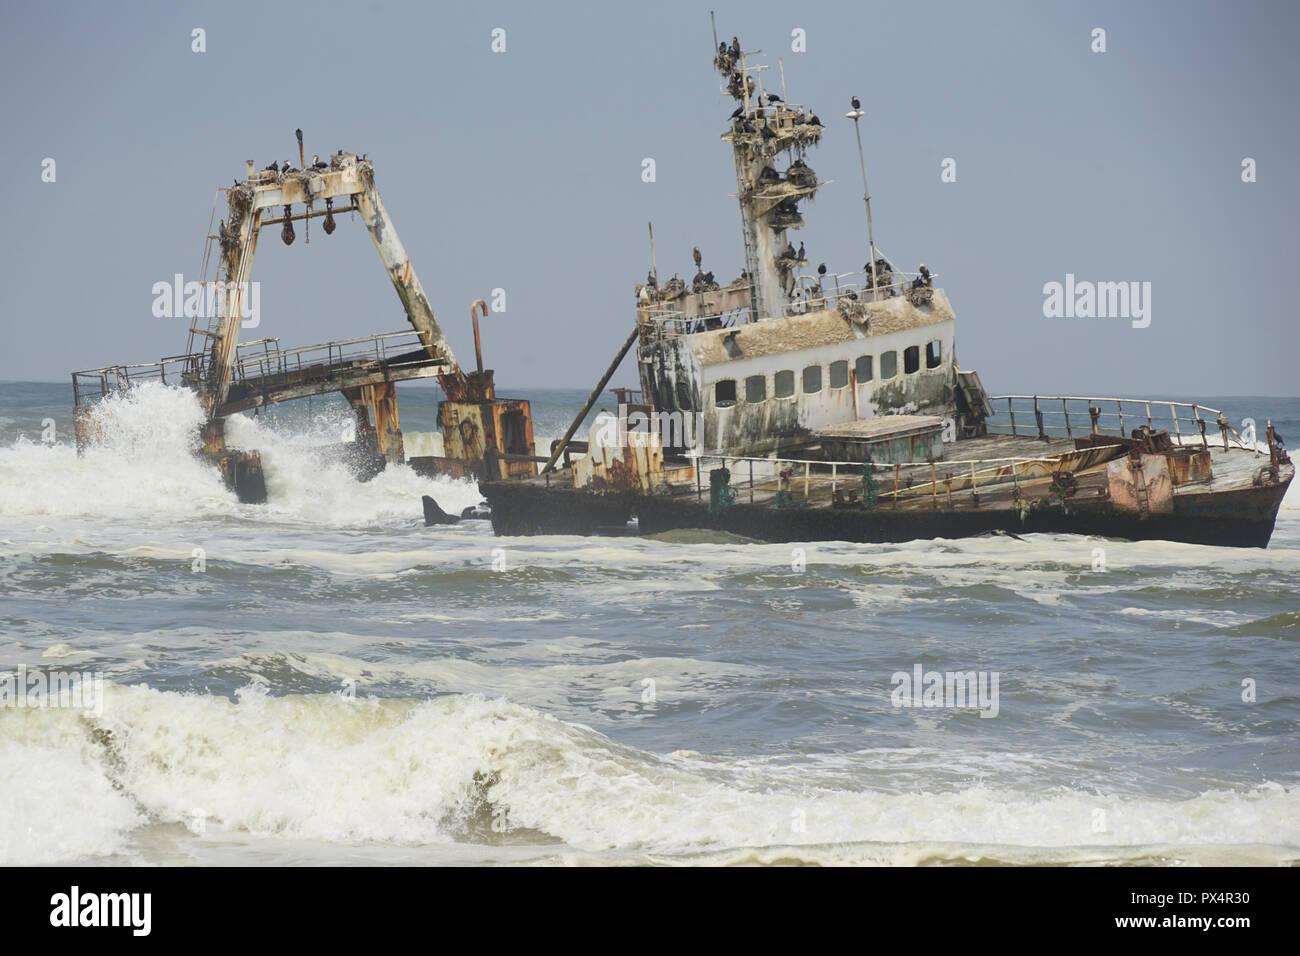 Gestrandeter Fischtrawler 'Zeila' bei Henties Bay, Skelettküste, Nester des Weißbrustkormoran  Dorob National Park, Atlantischer Ozean, Namibia - Stock Image